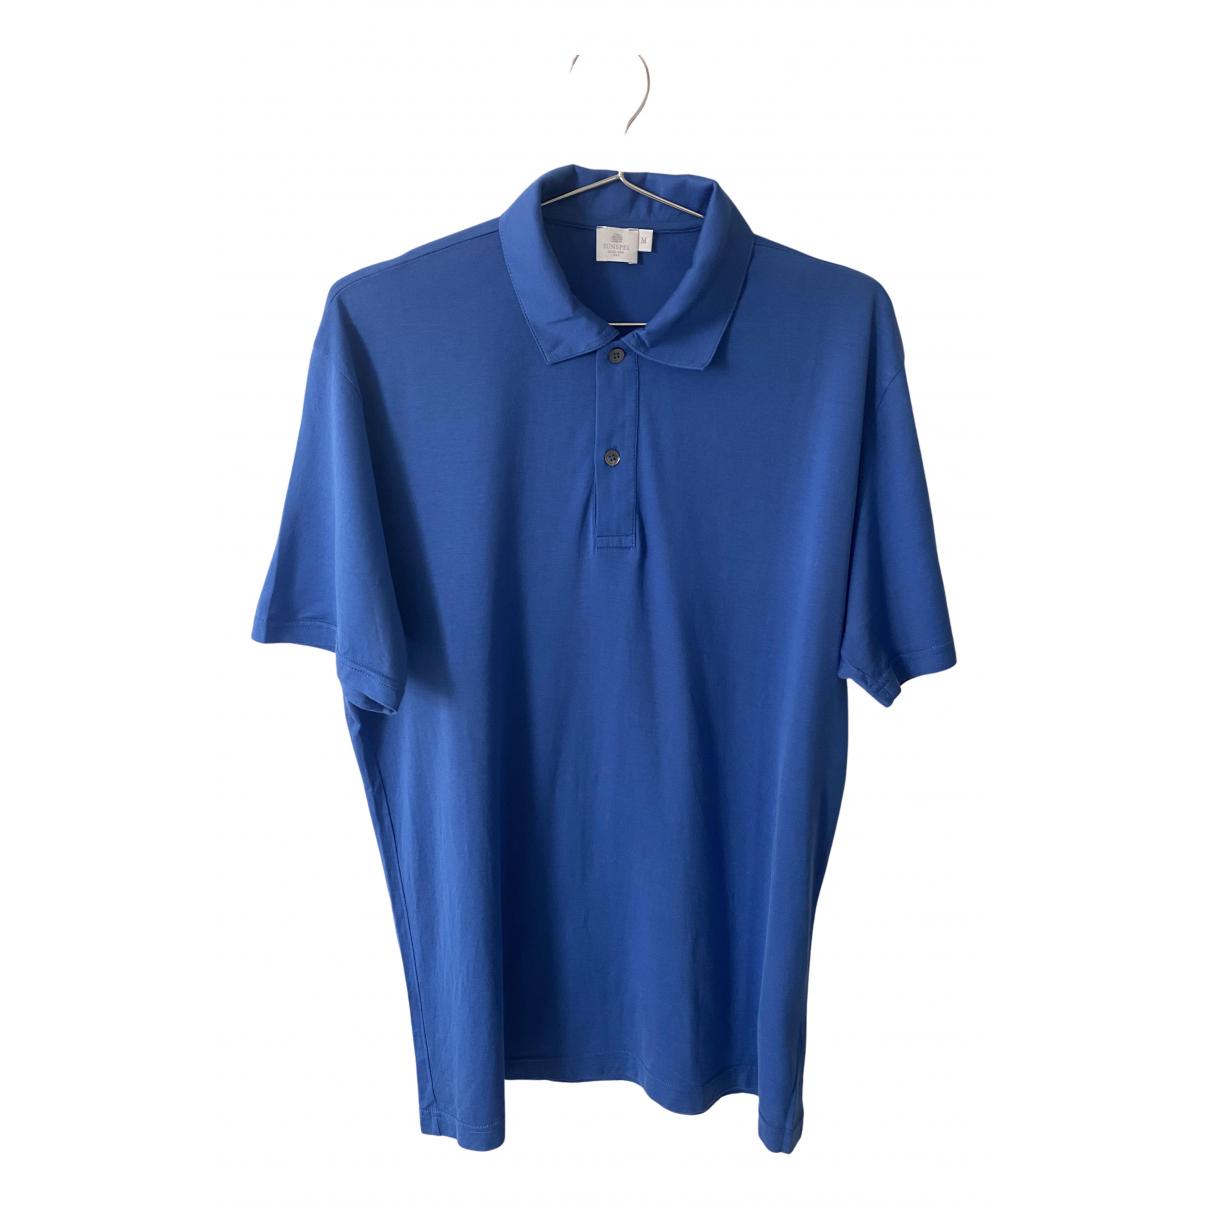 Polo en Algodon Azul Sunspel